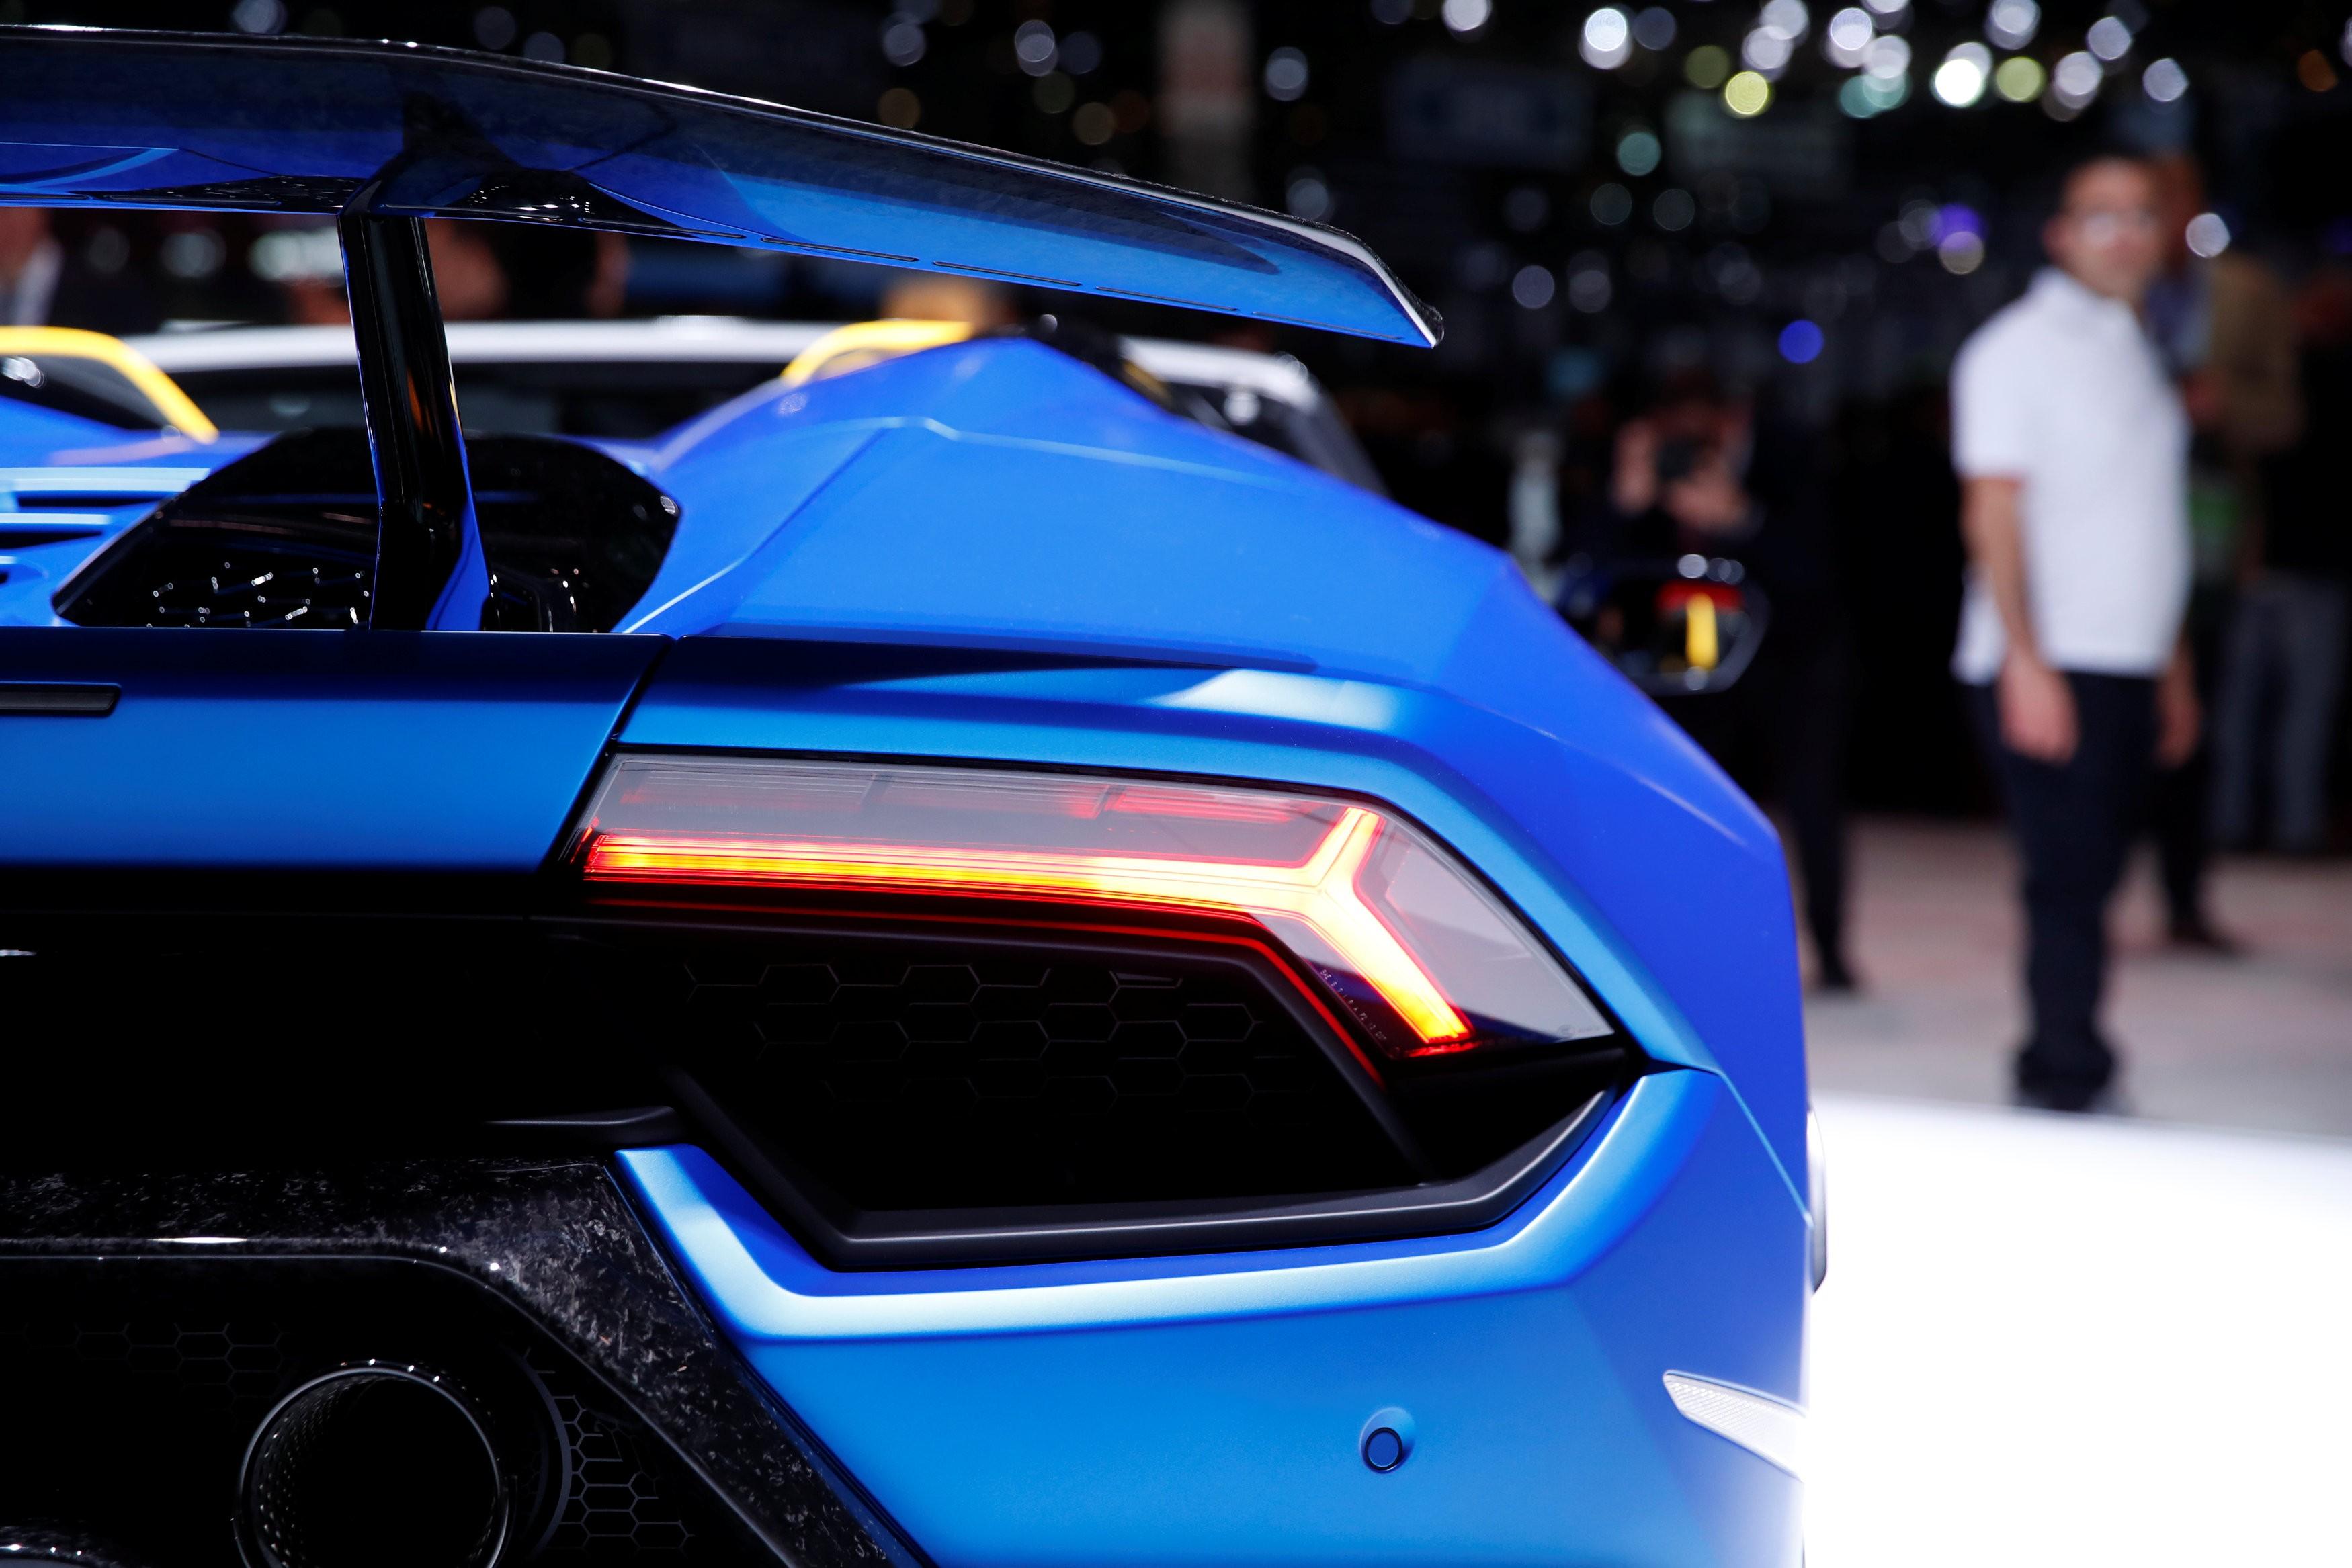 Geneva Auto Show Mercedes Porsche And Lamborghini Show Edge Over - Sports car show